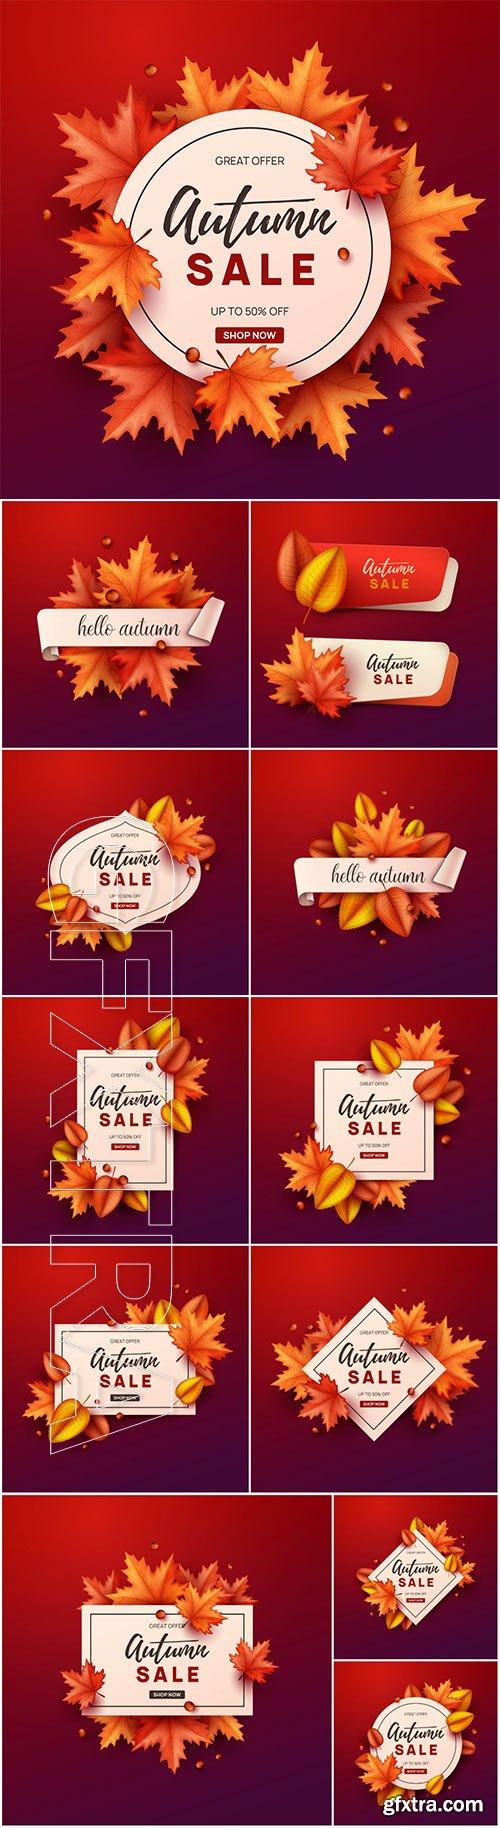 Autumn art frame vector design illustration